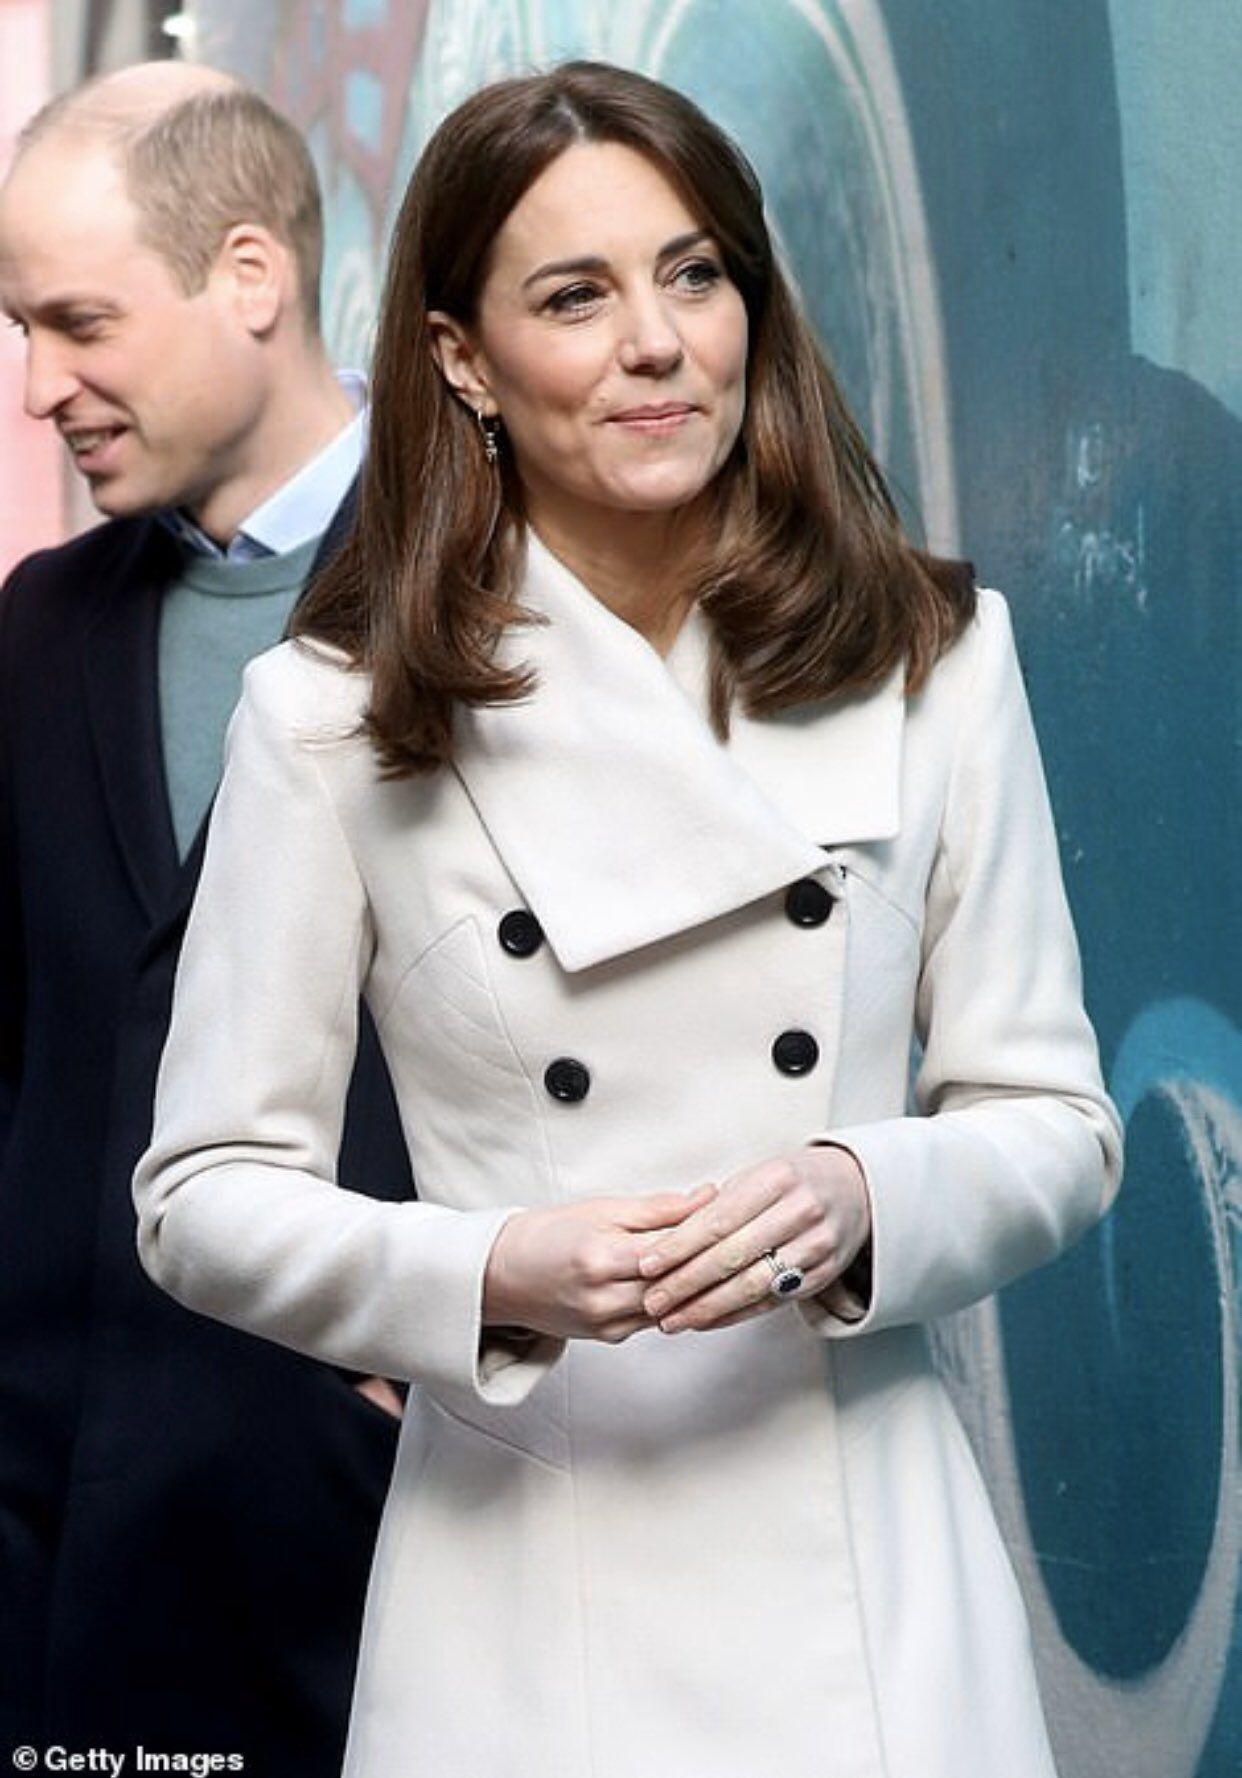 Crown Pandora 👑 on in 2020 Duchess of cambridge, Kate